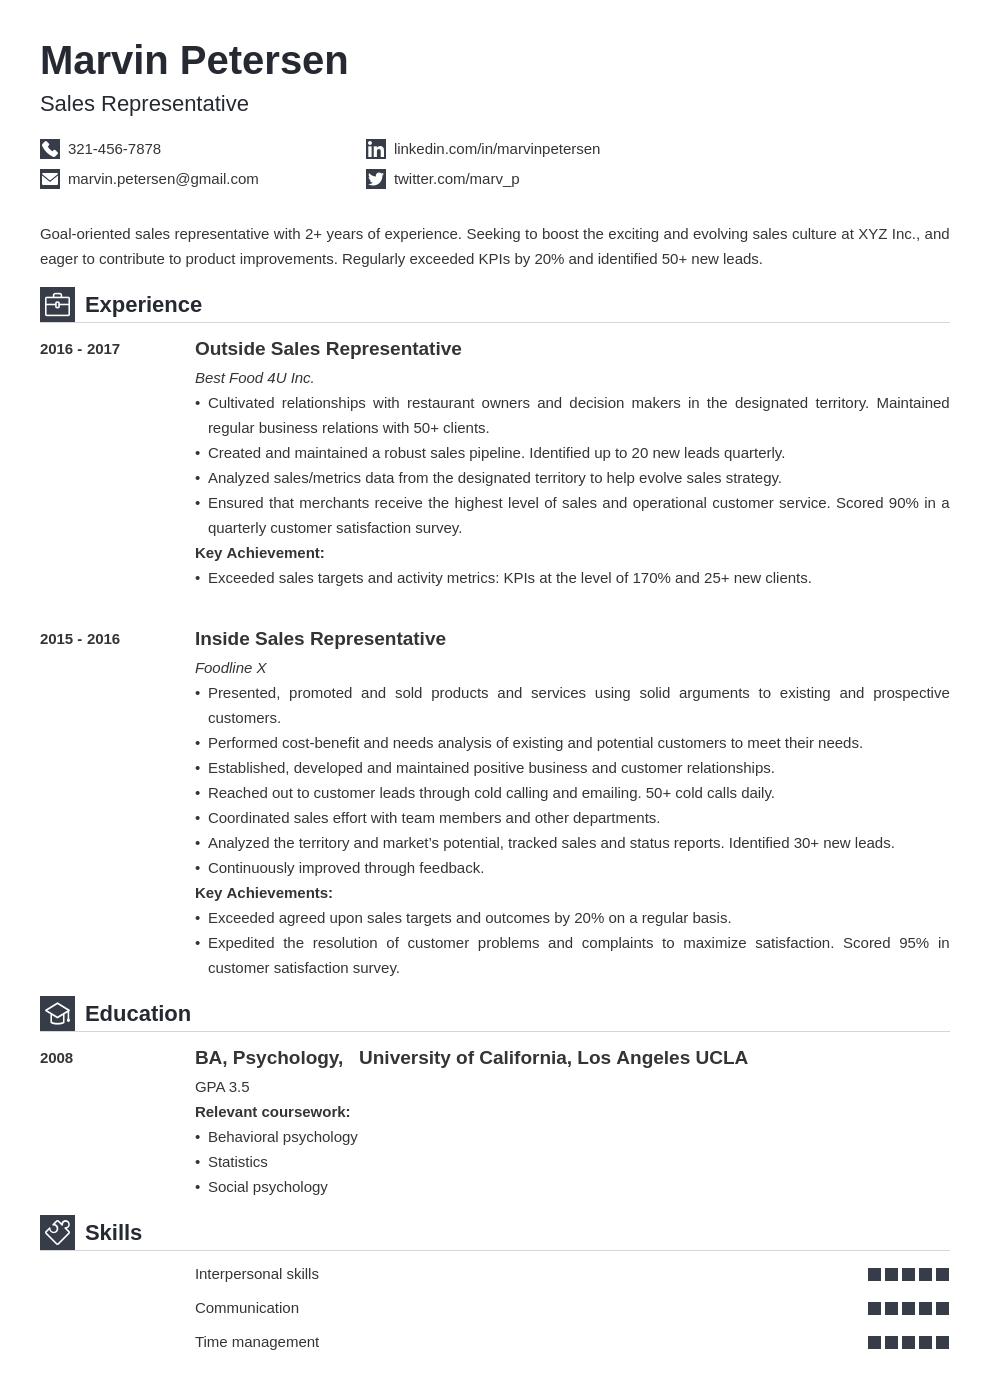 sales representative template iconic uk